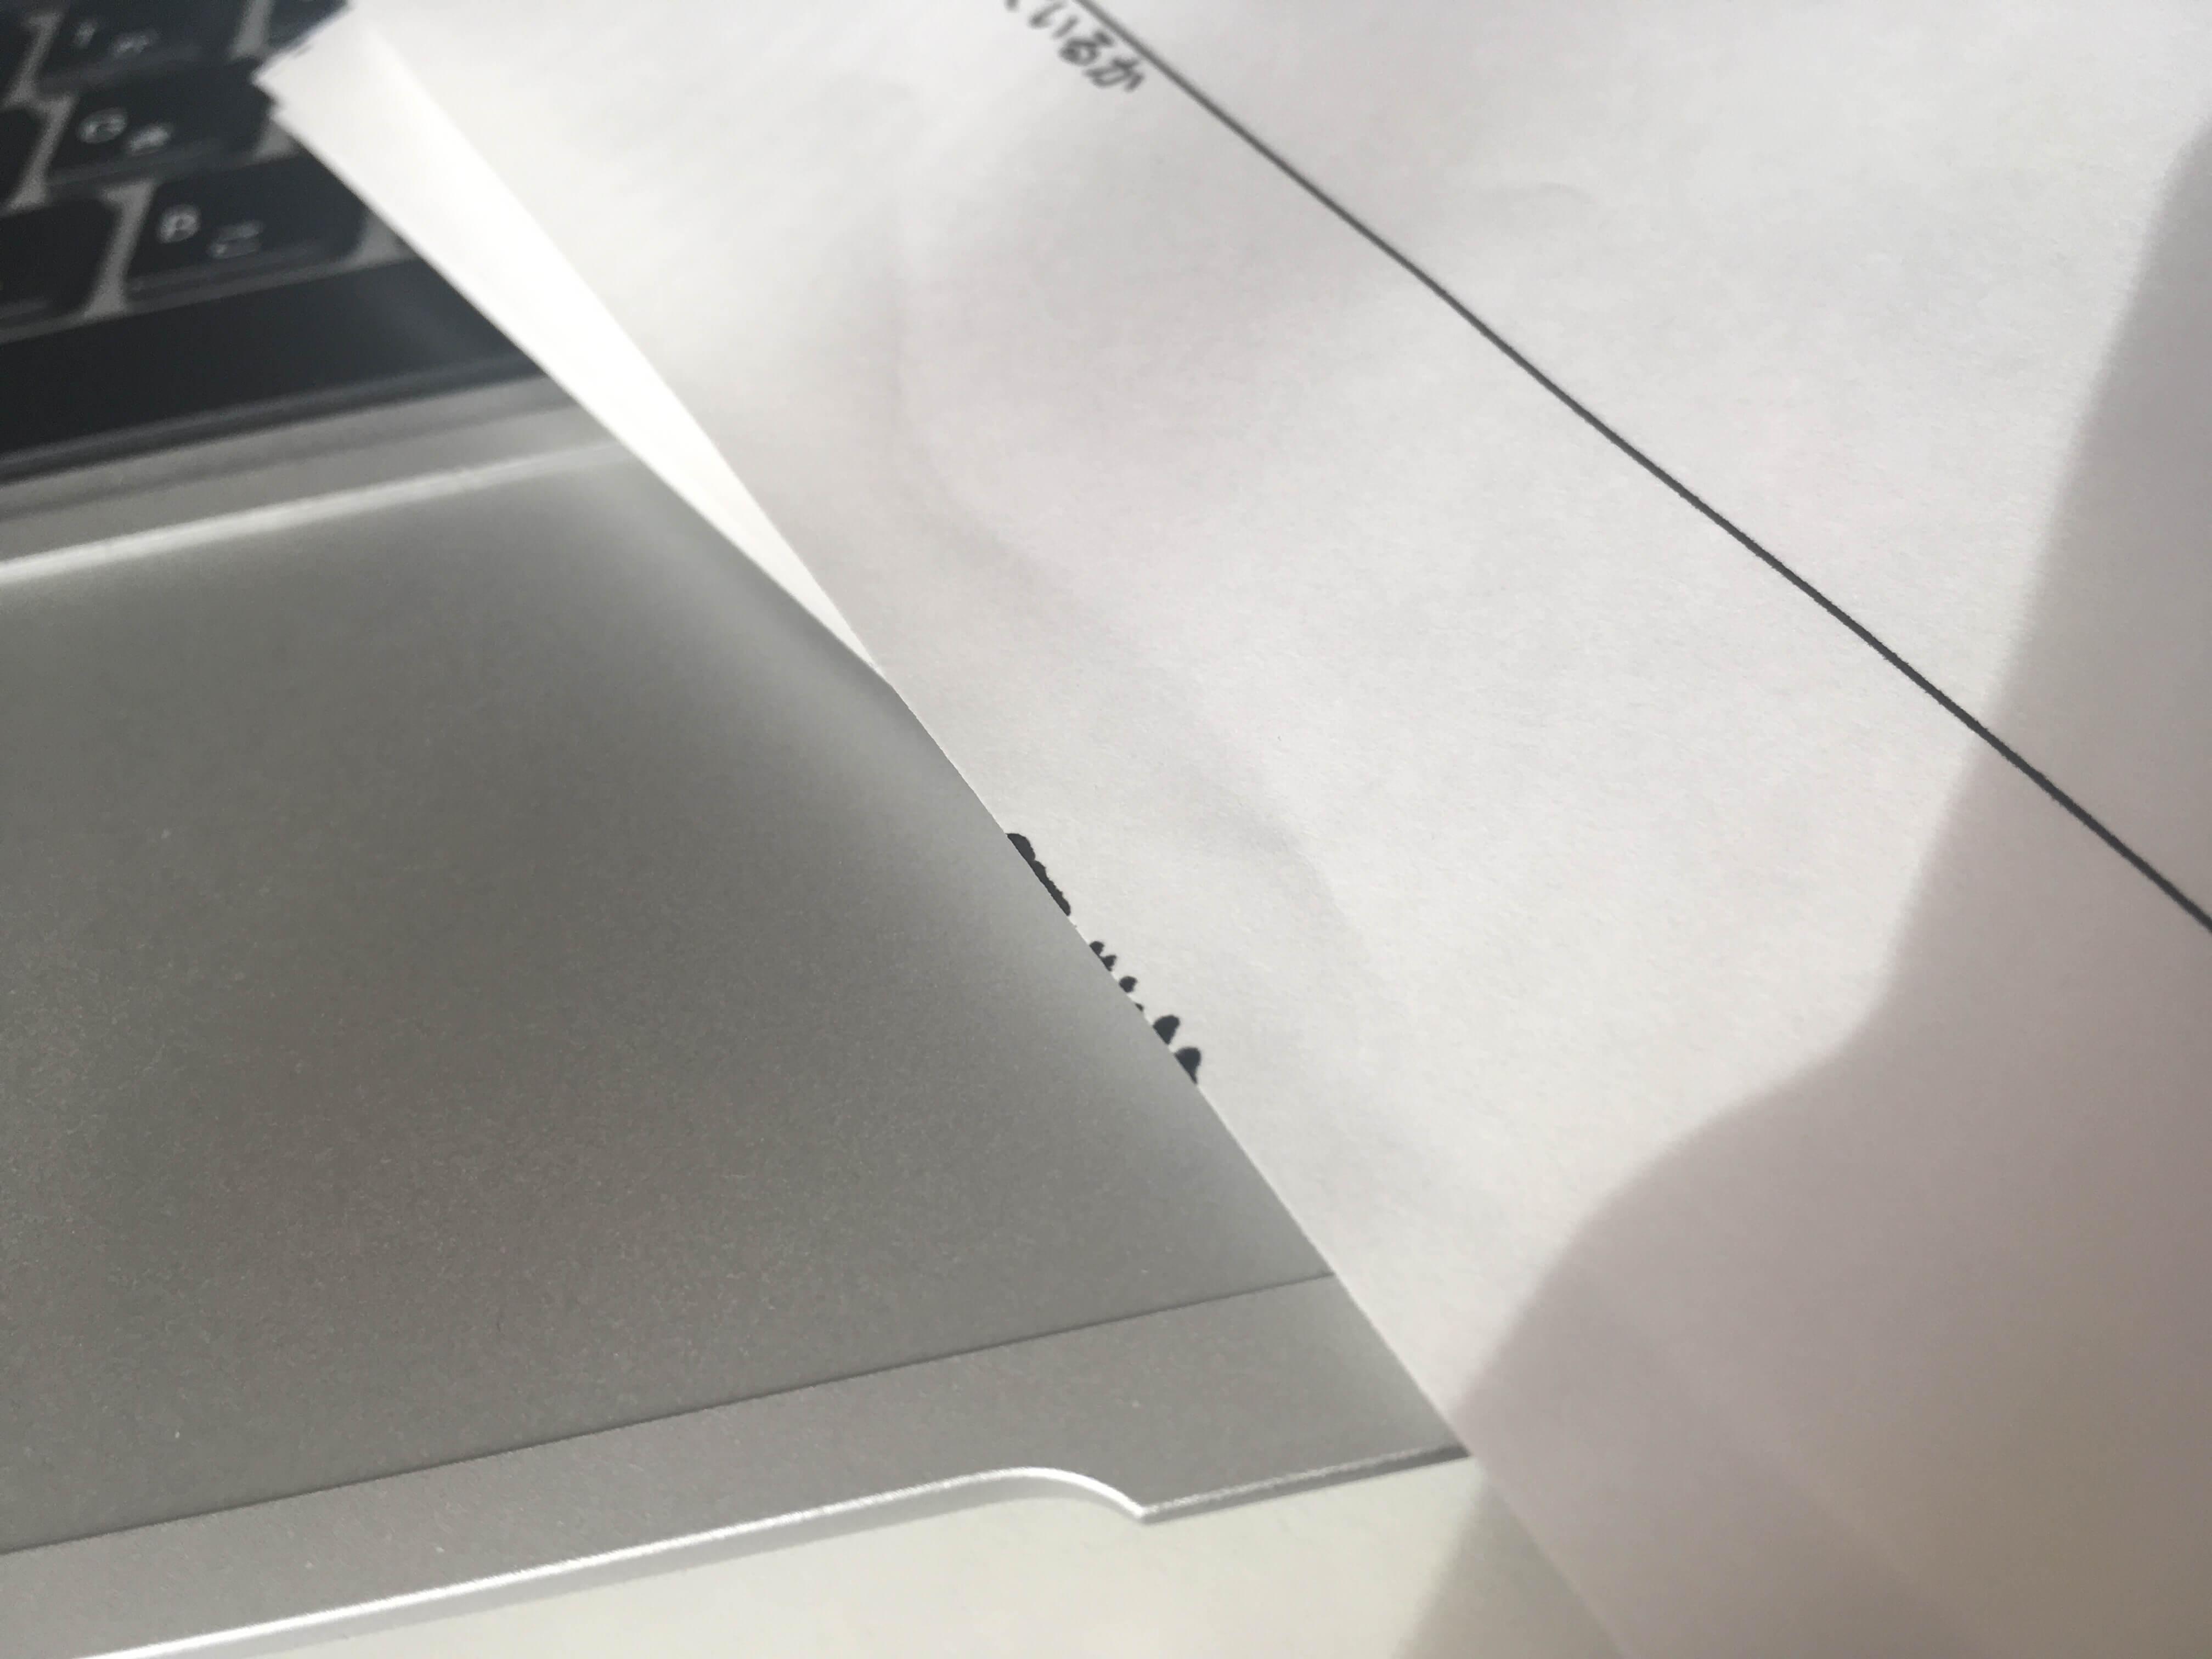 PX-K150 インク漏れ